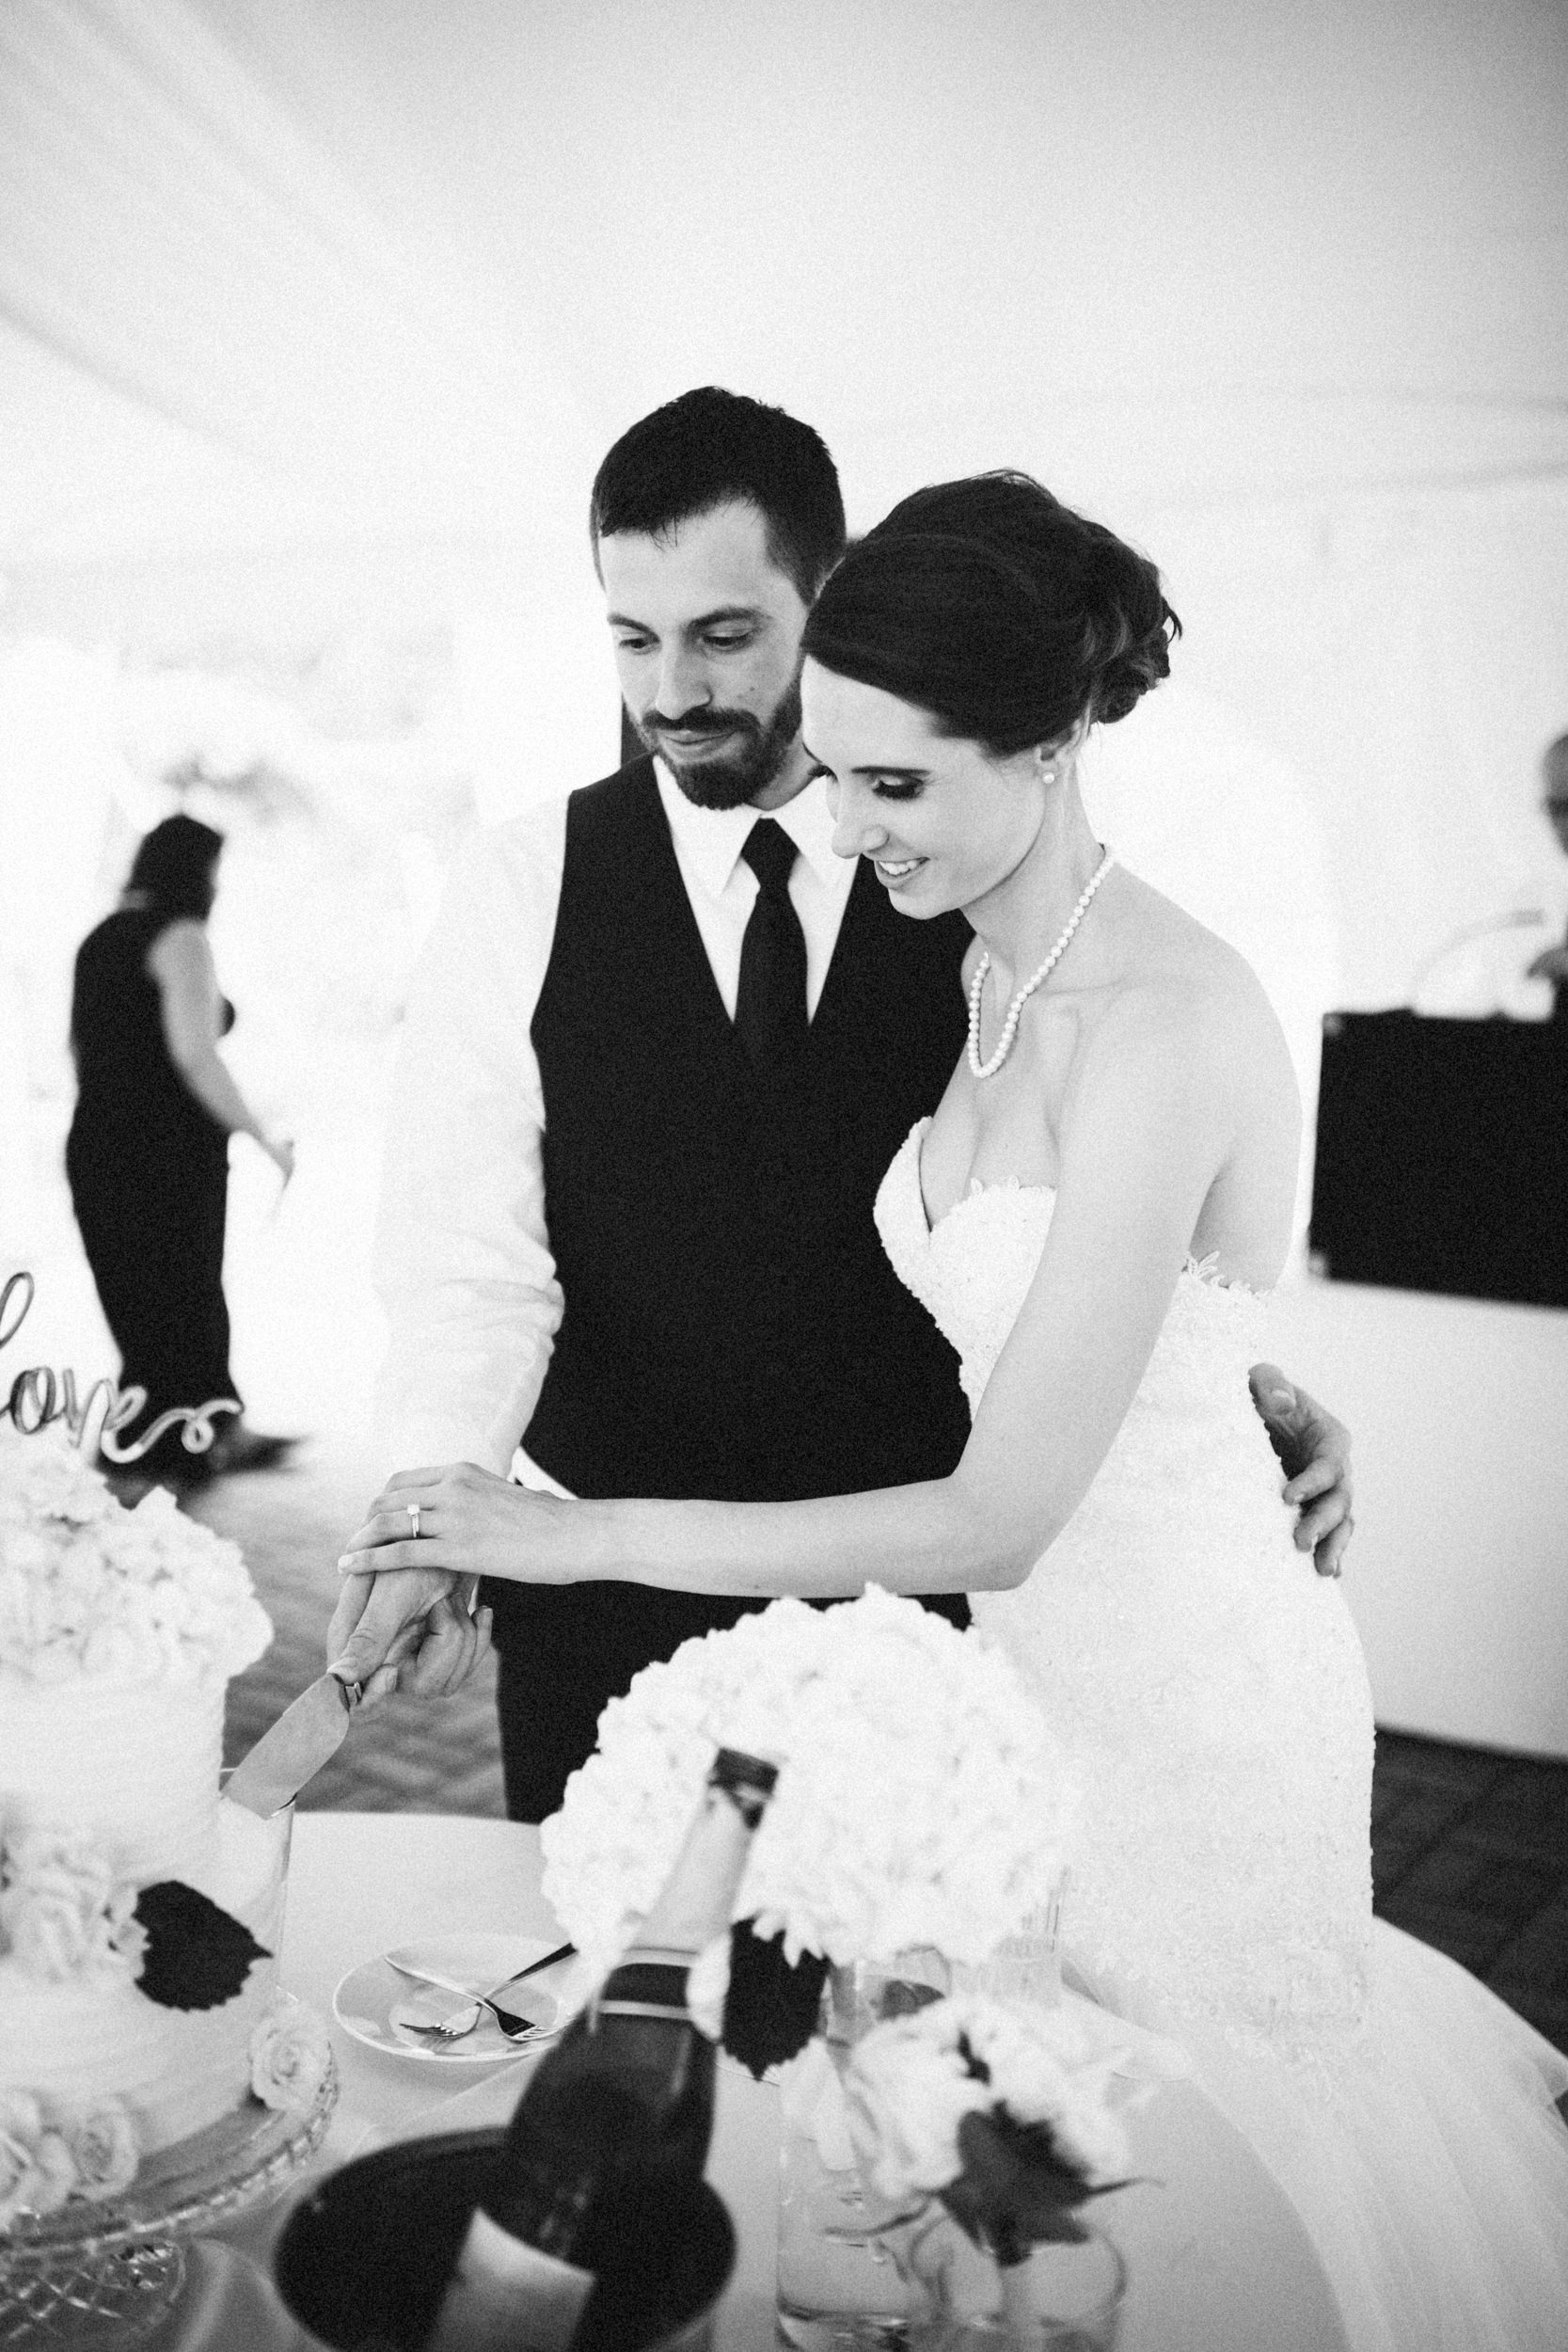 Louisville-Kentucky-Wedding-Elopement-Photographer-Sarah-Katherine-Davis-Photography-Whitehall-Classic-Timeless-Garden-Wedding-638.jpg